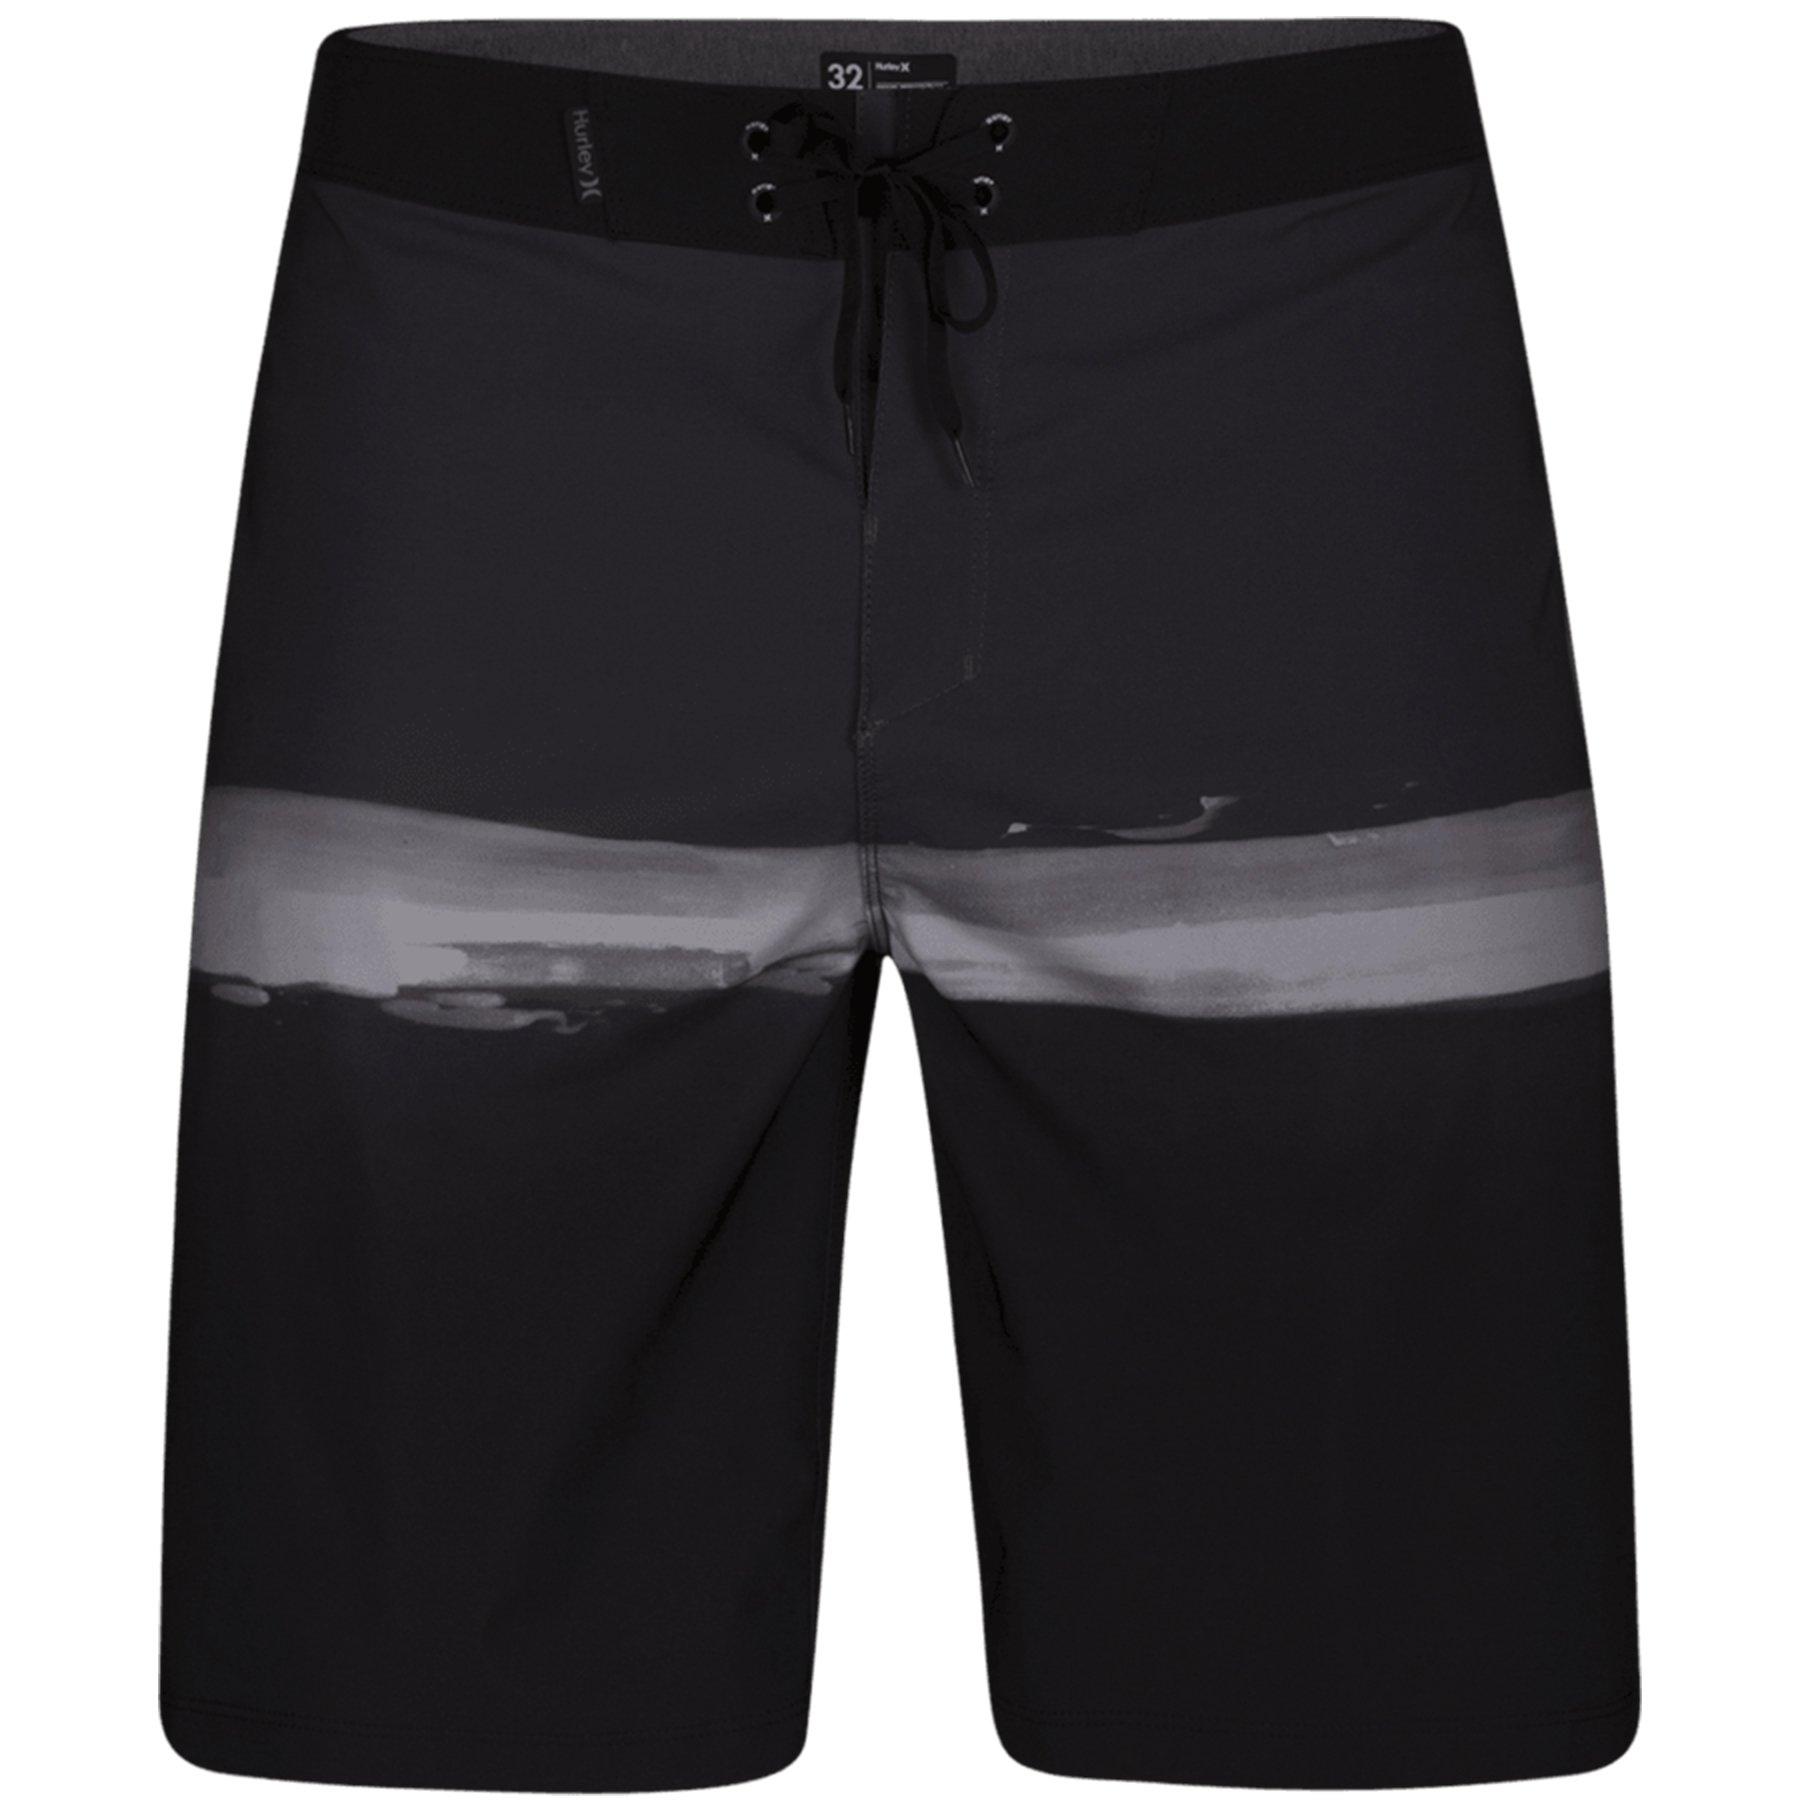 Hurley Men's Phantom Pure Glass 20 inch Wicking Stretch Boardshorts, Black (010), 30